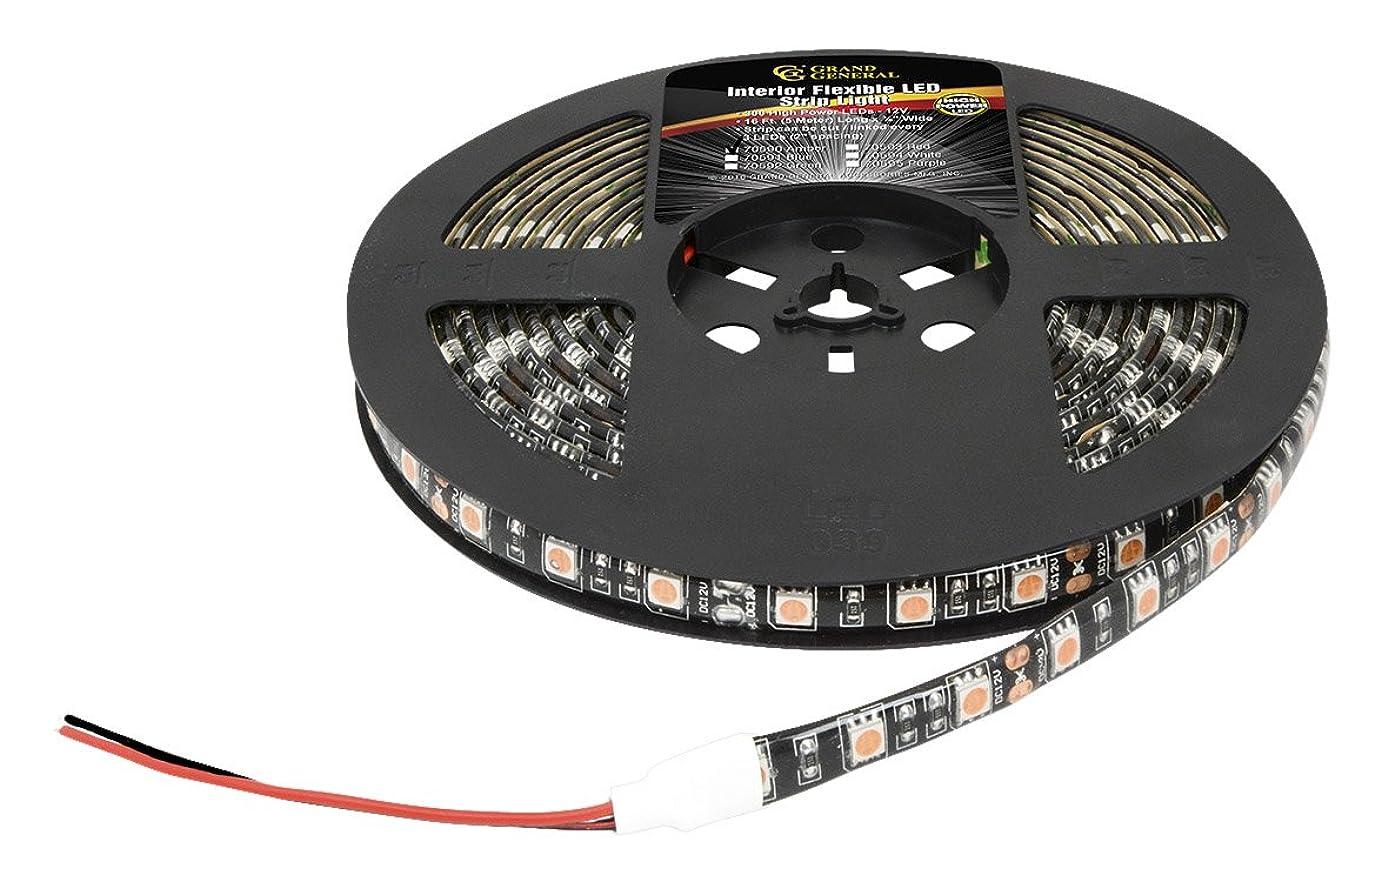 Grand General 70590 Premium Flexible 16ft 5050 LED Strip Light Waterproof For Interior Use- Amber